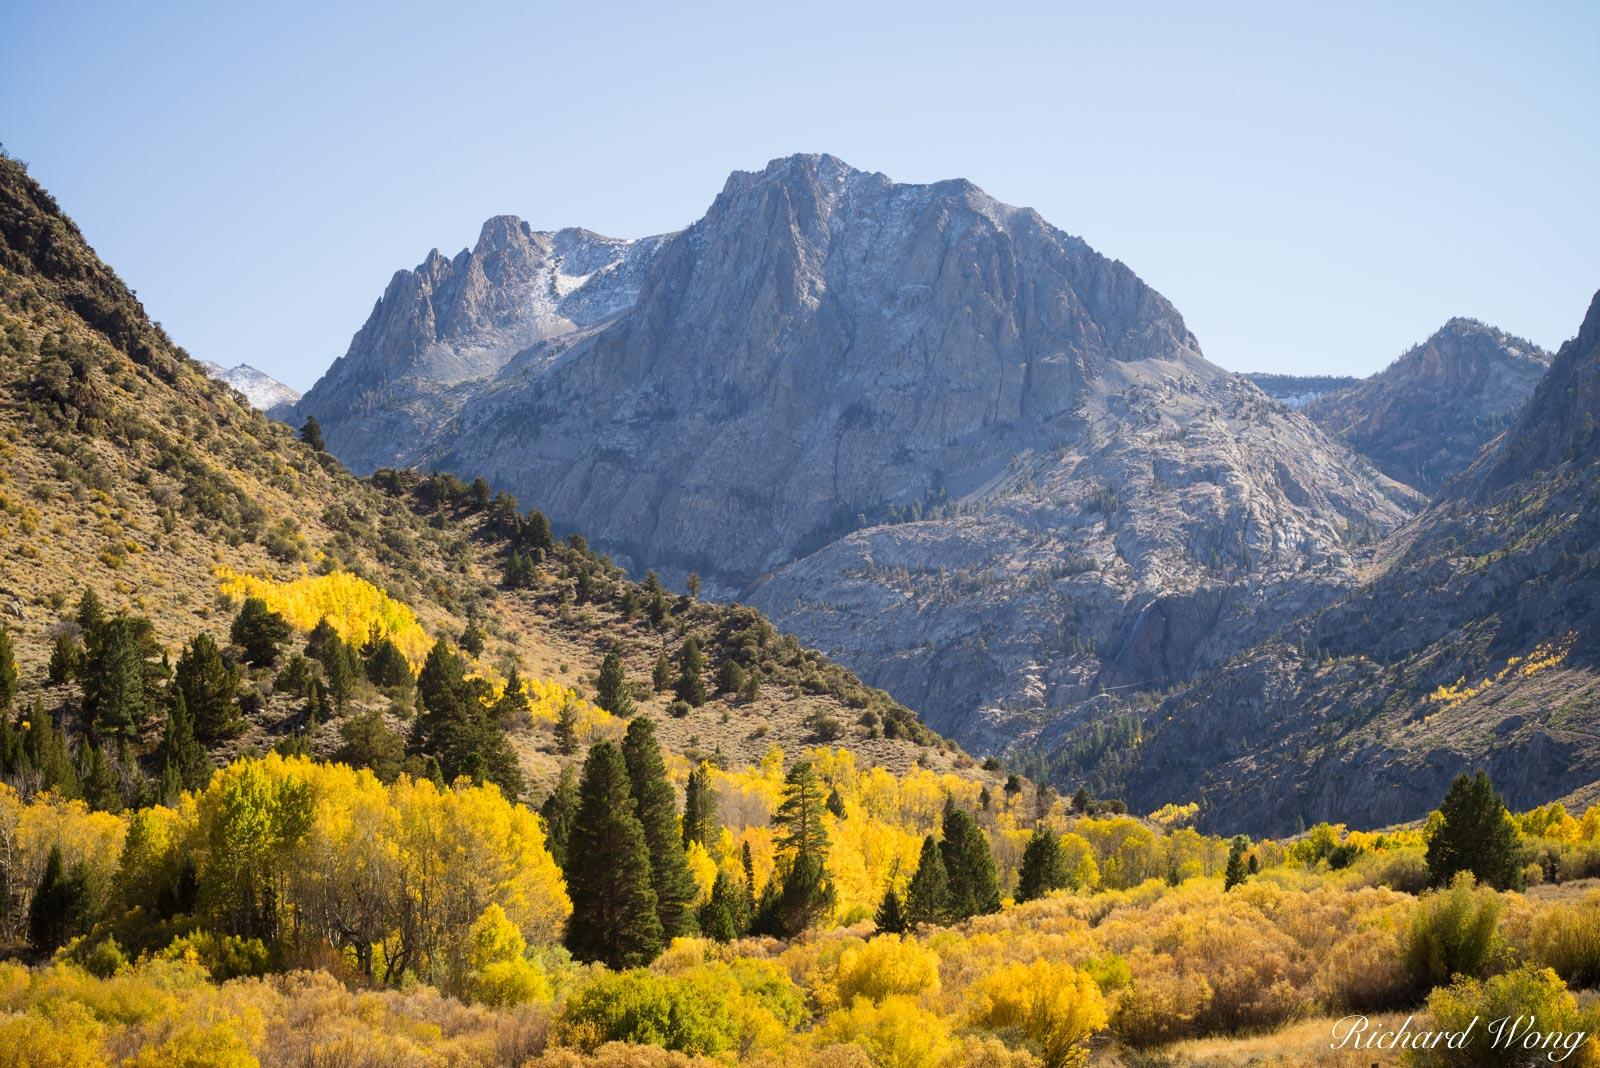 June Lakes Loop Aspen Fall Color With Carson Peak in Background, Eastern Sierra, California, photo, photo